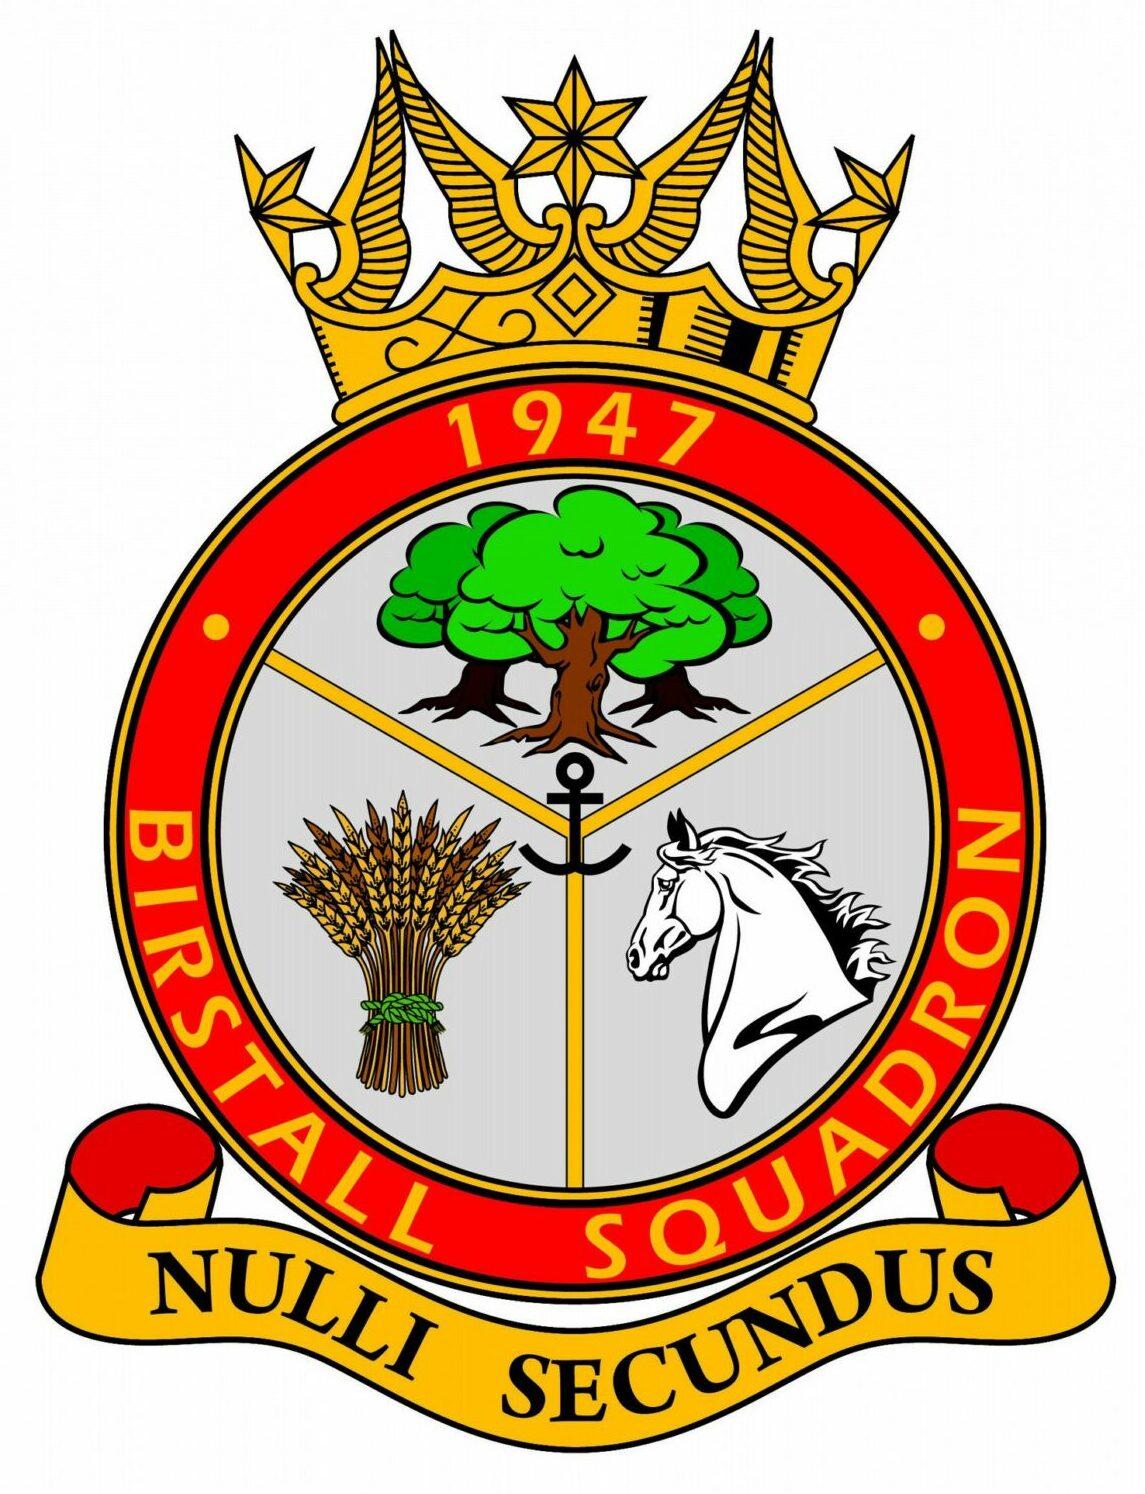 1947(Birstall) Squadron